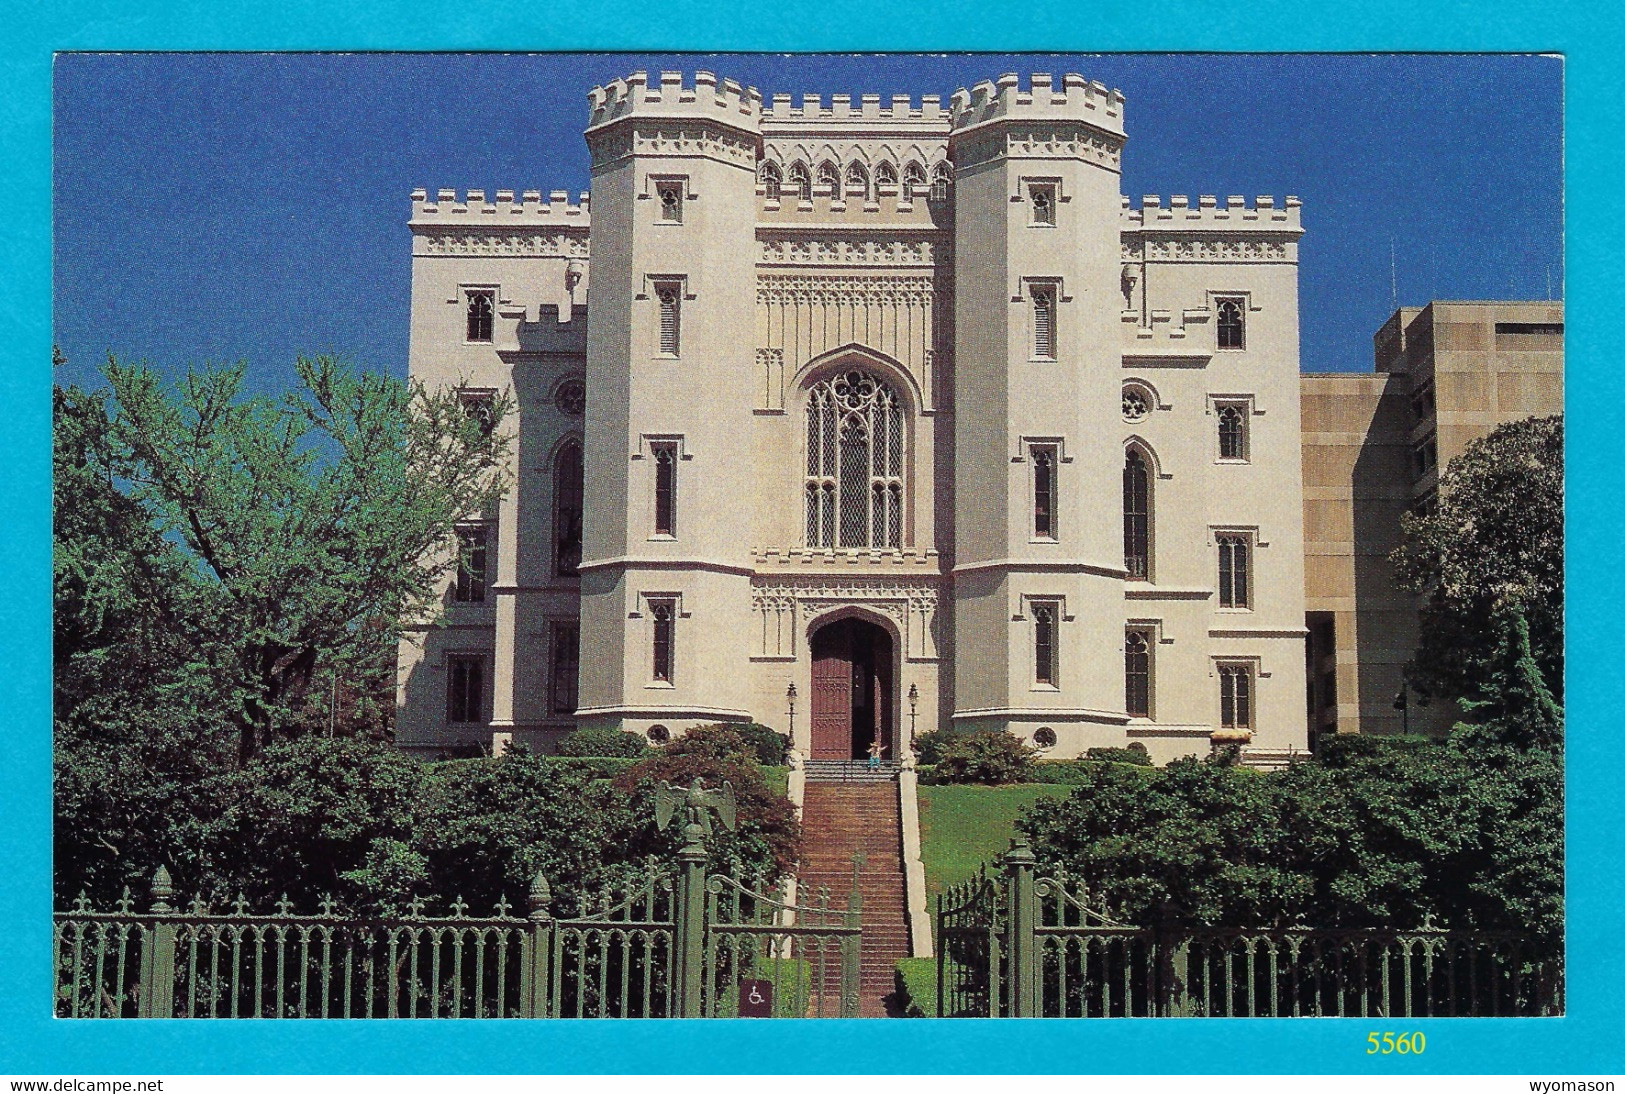 Old State Capitol - Baton Rouge, Louisiana [#5560] - Baton Rouge